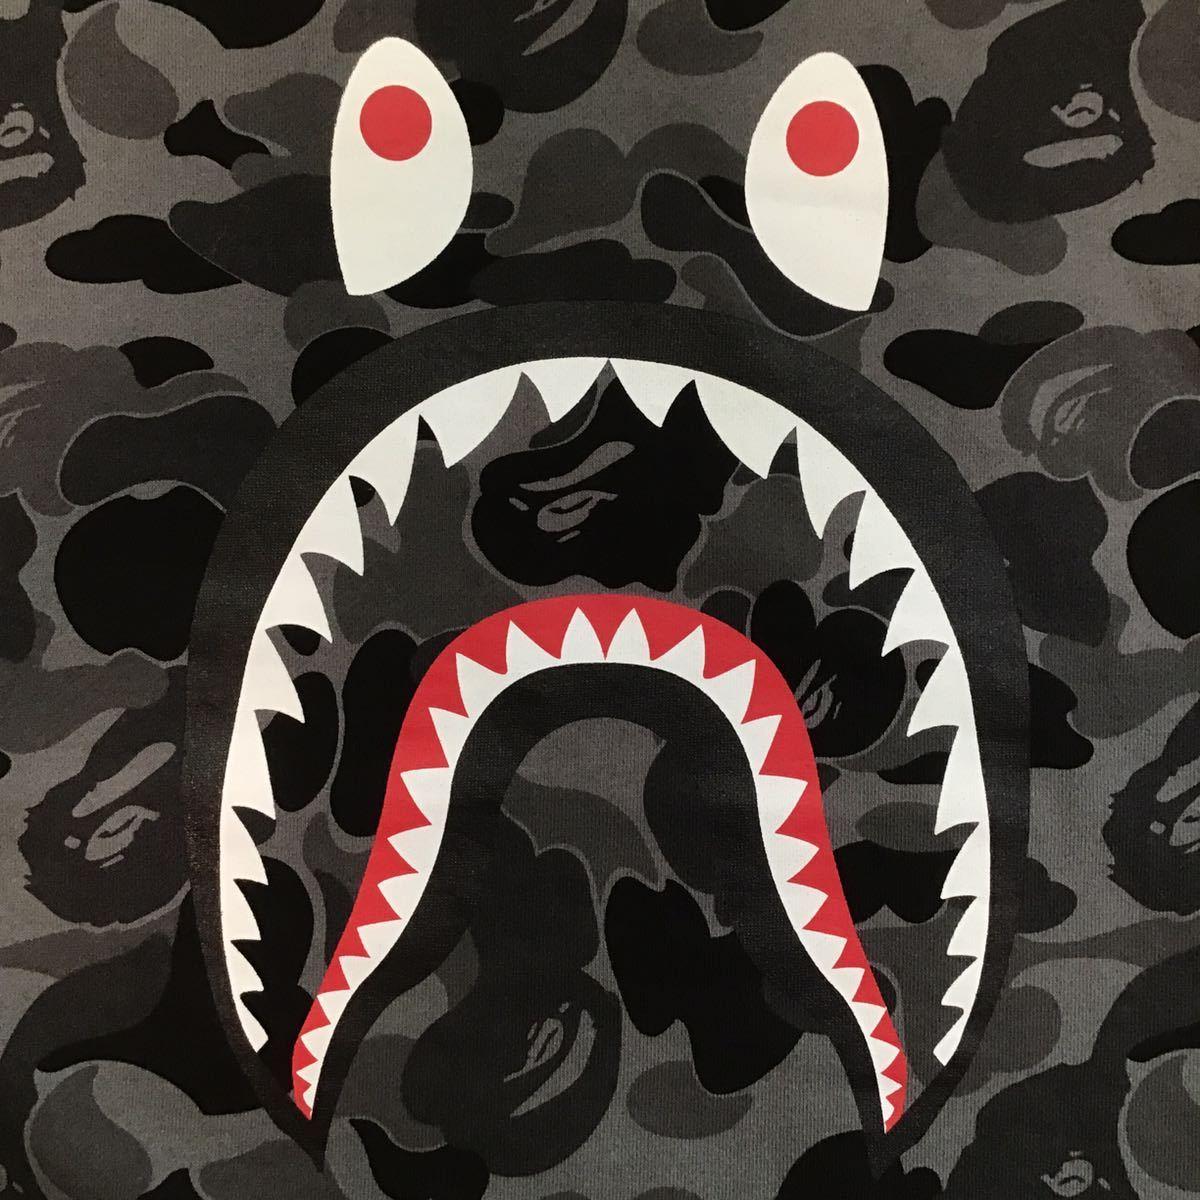 ★2XL★ シャーク 長袖 スウェット a bathing ape BAPE shark sweat エイプ ベイプ トレーナー dark gray color camo 迷彩 XXL WGM 2141